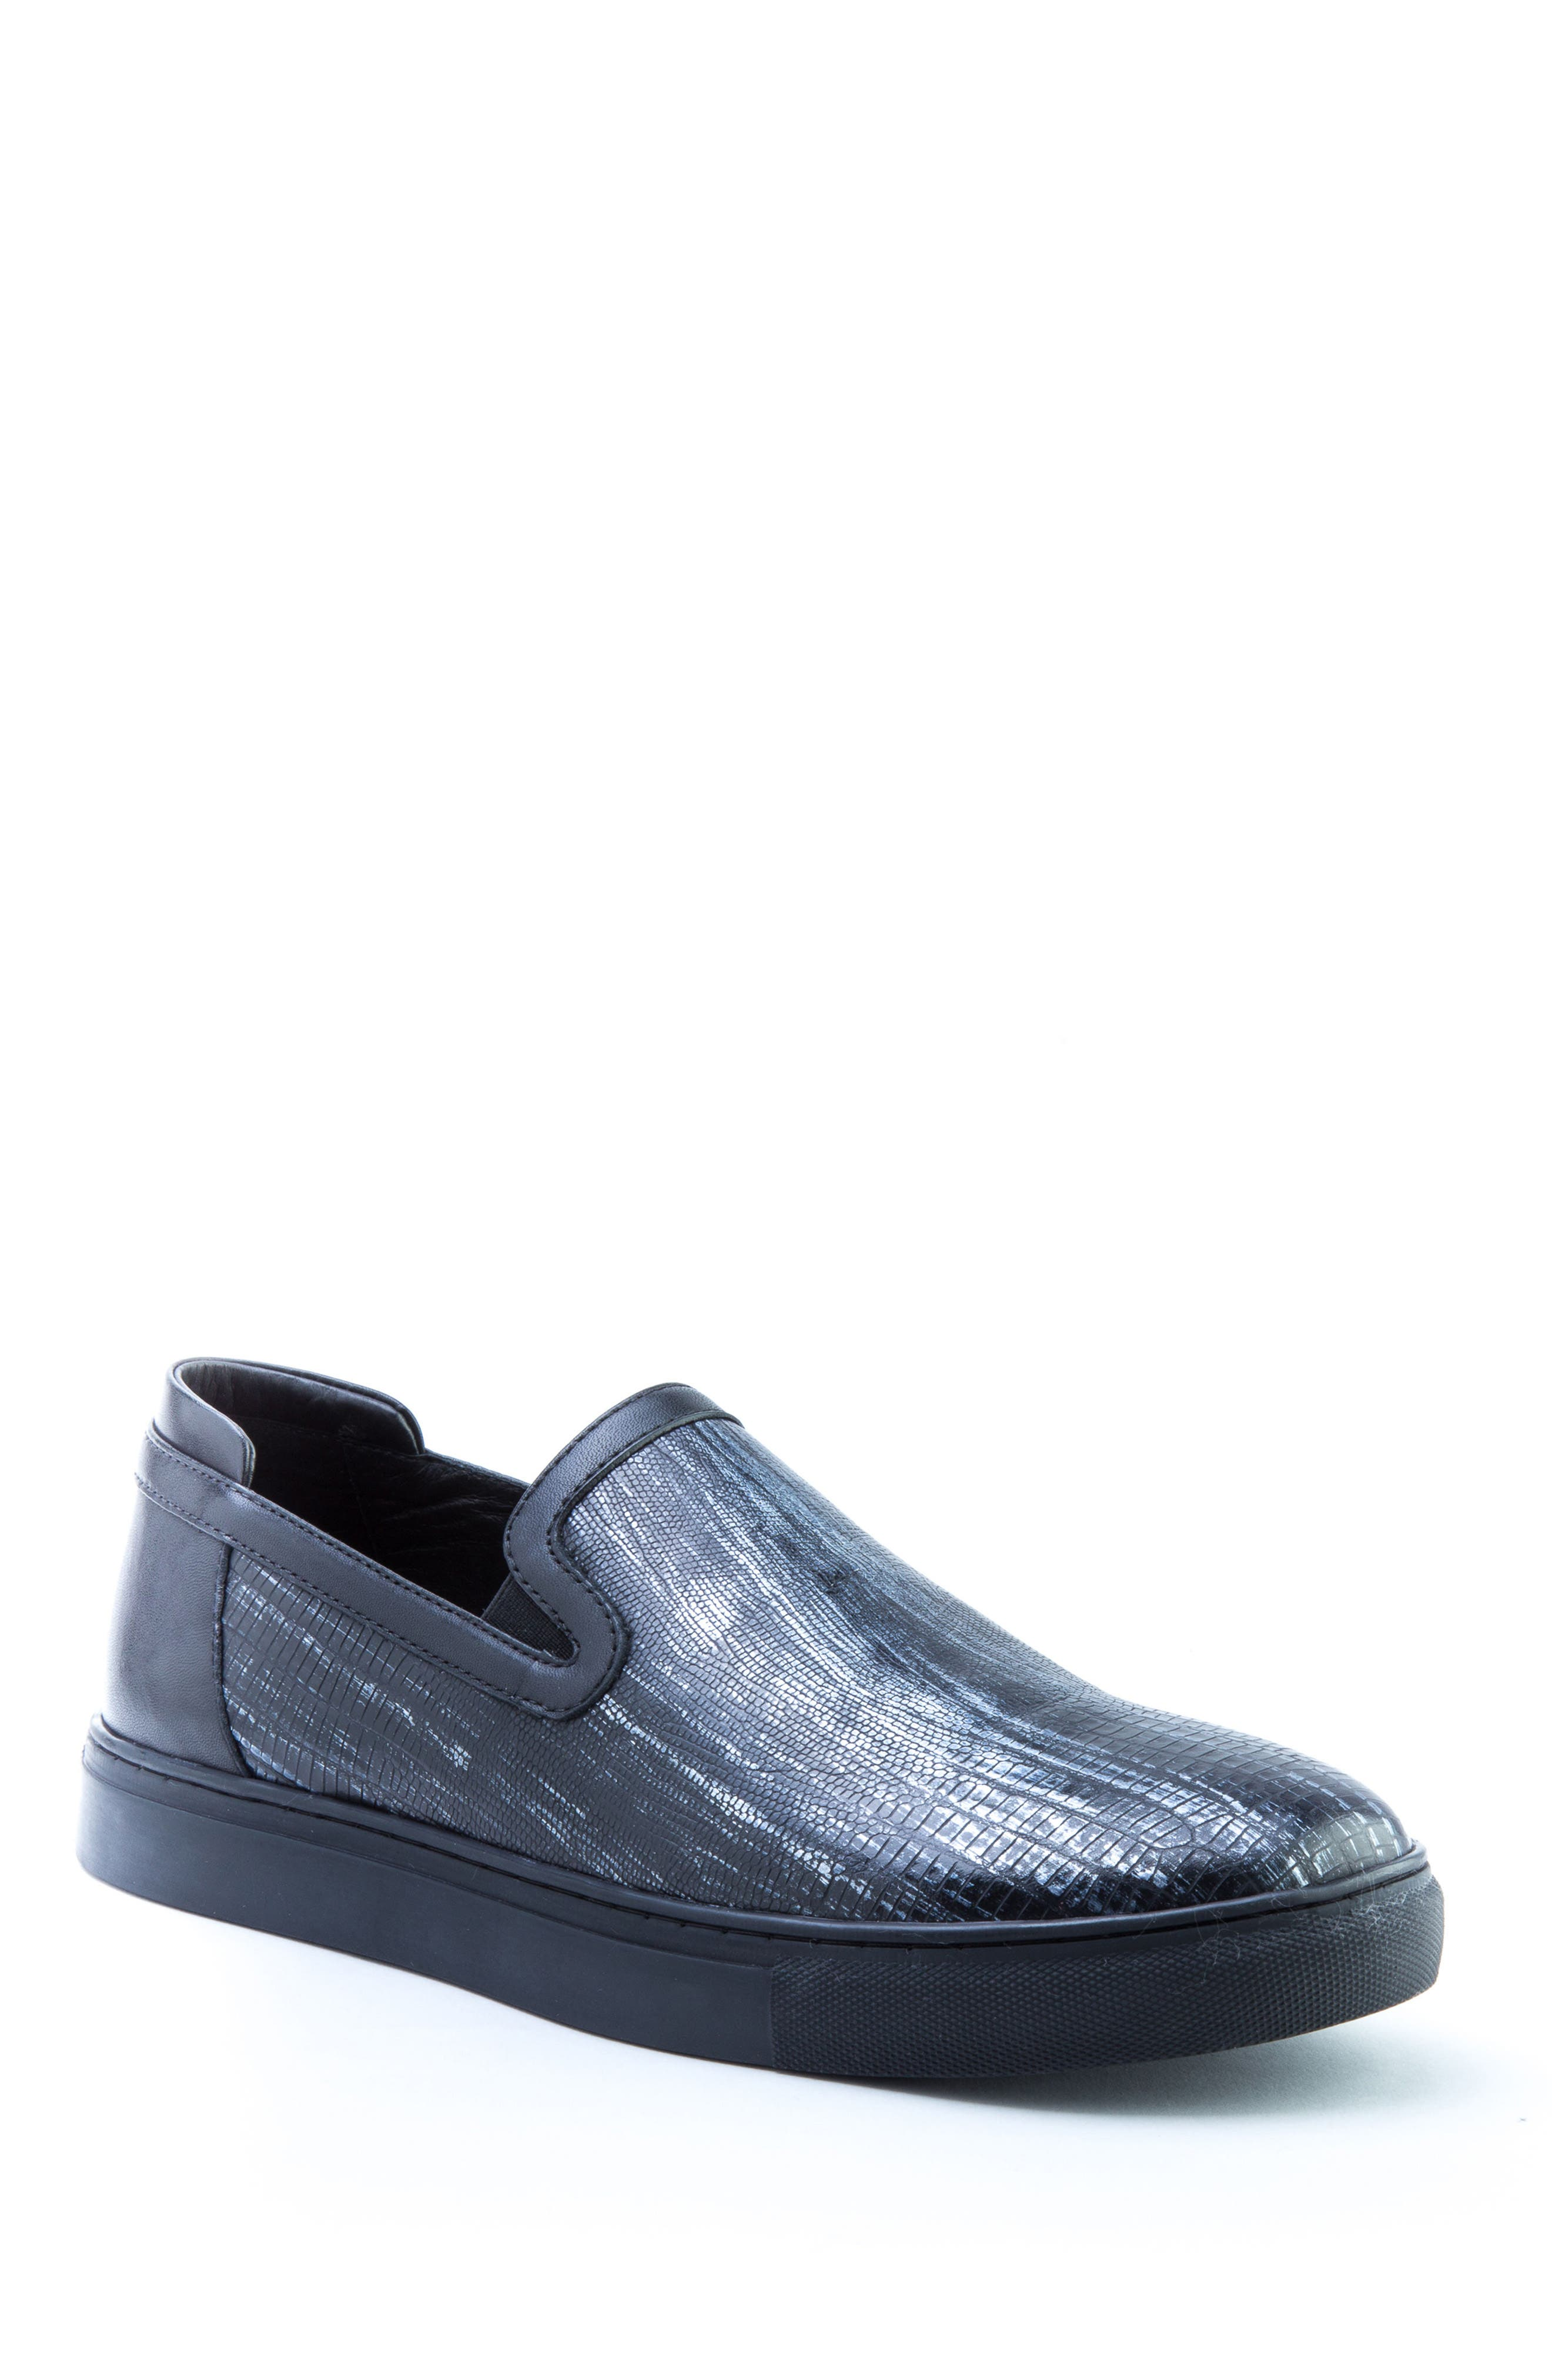 Badgley Mischka Bogart Sneaker, Black